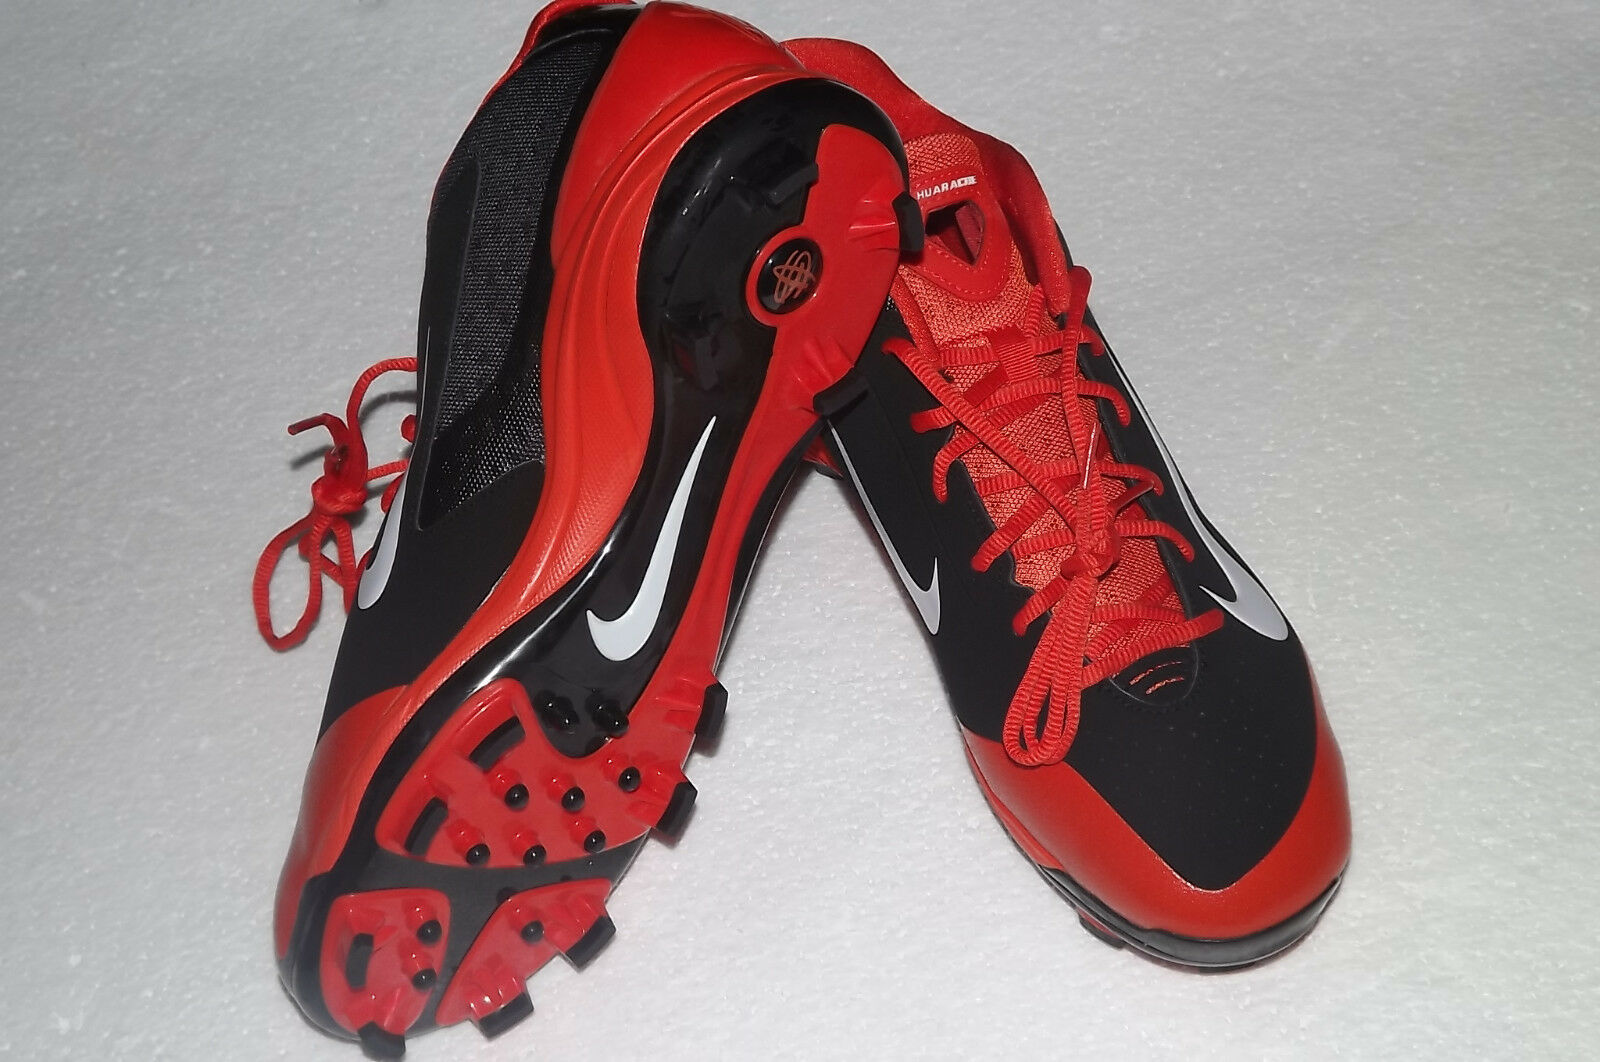 MENS NIKE AIR HUARACHE PRO LOW BASEBALL CLEATS ORANGE/BLACK 616922-019 Price reduction Wild casual shoes